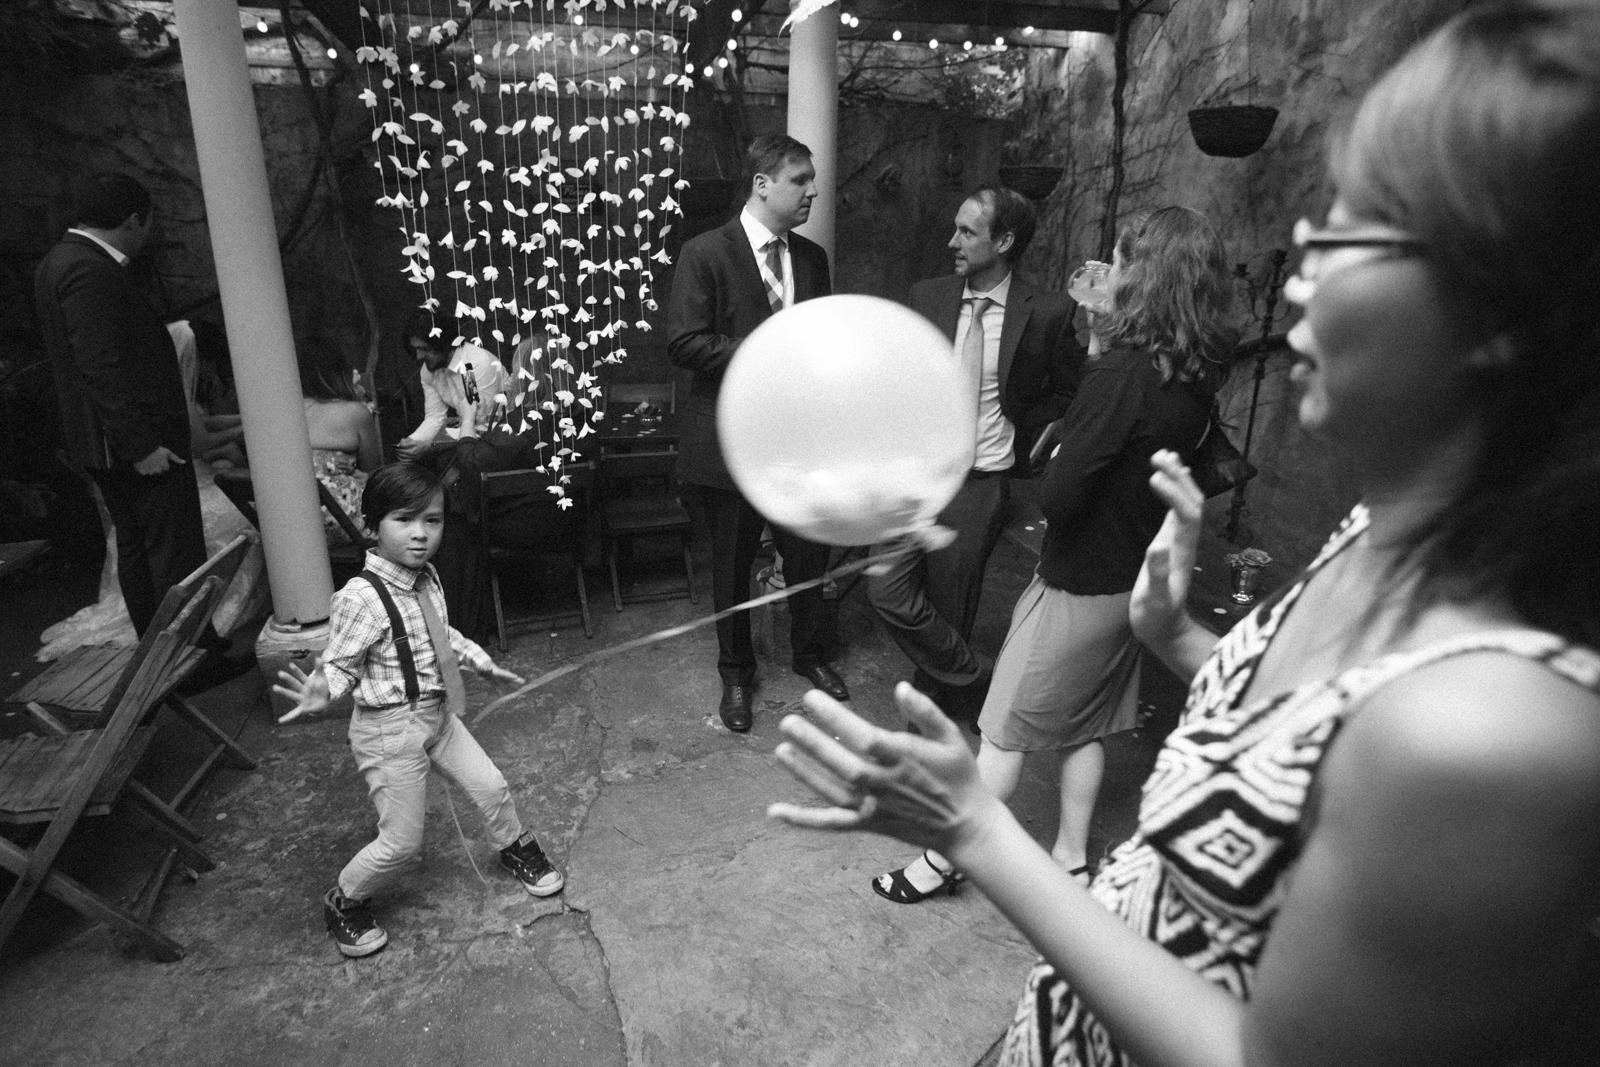 NYC Wedding Photography Lofts at Prince Brooklyn NYC Photographer Boris Zaretsky _B2C0833.jpg